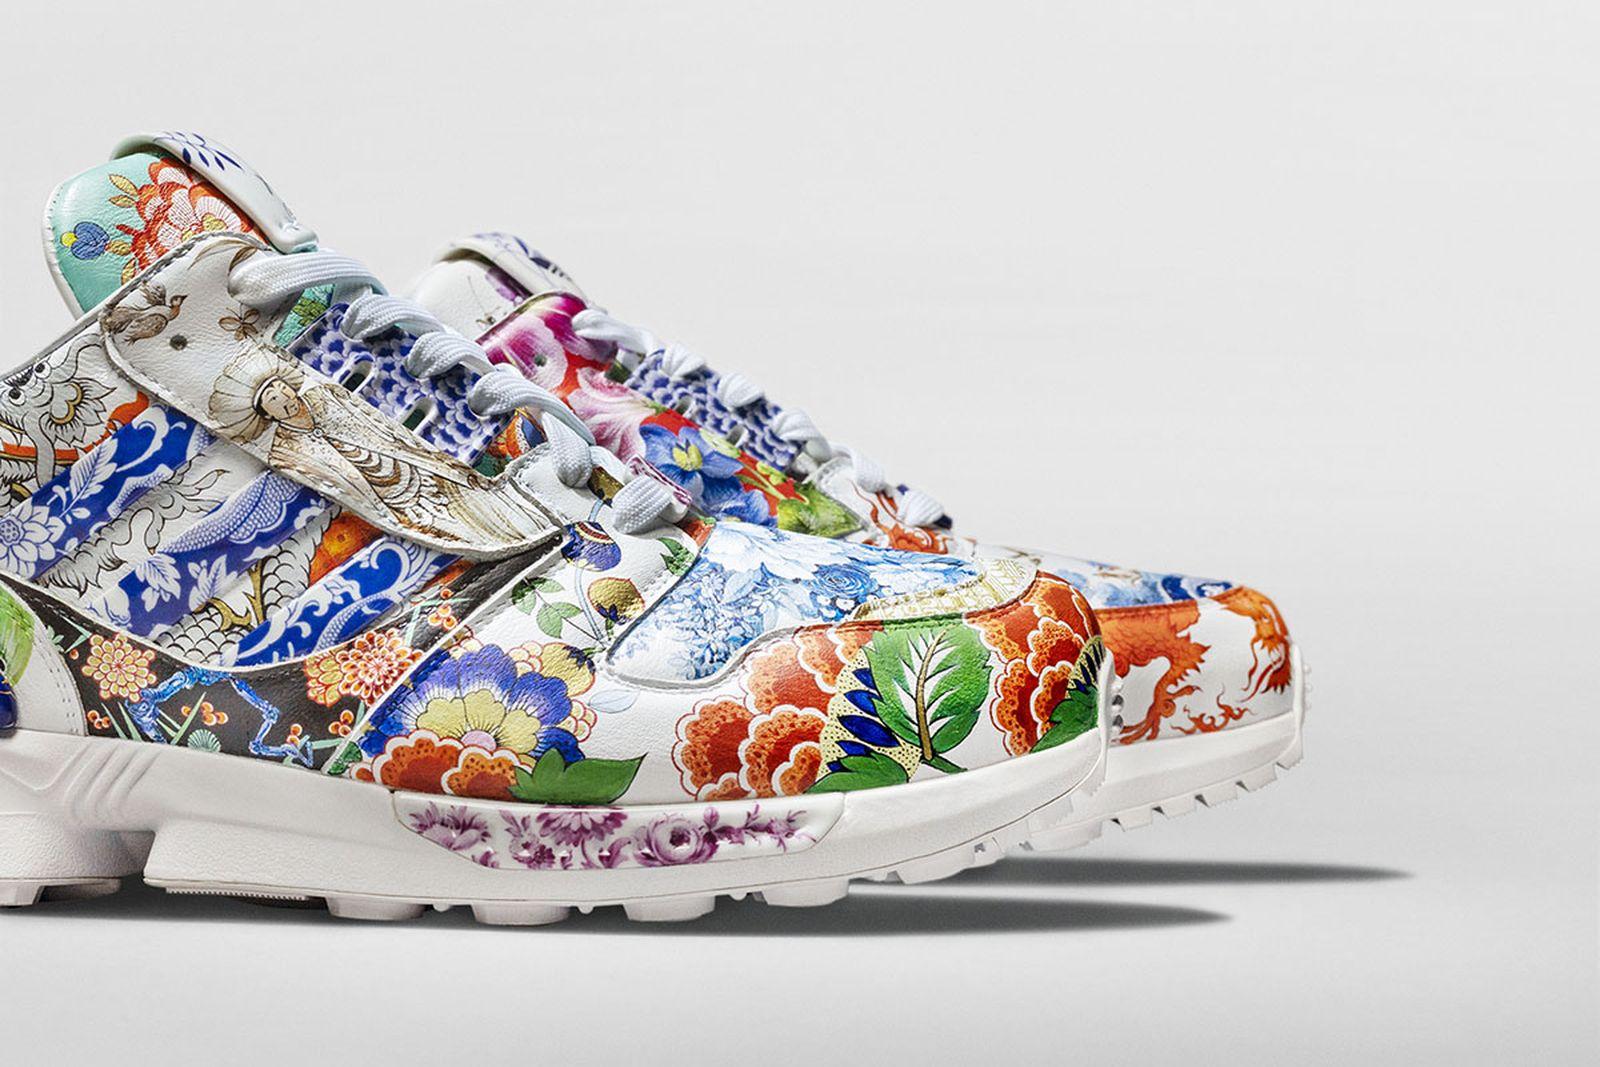 meissen-adidas-zx8000-porcelain-auctioning-sothebys-04